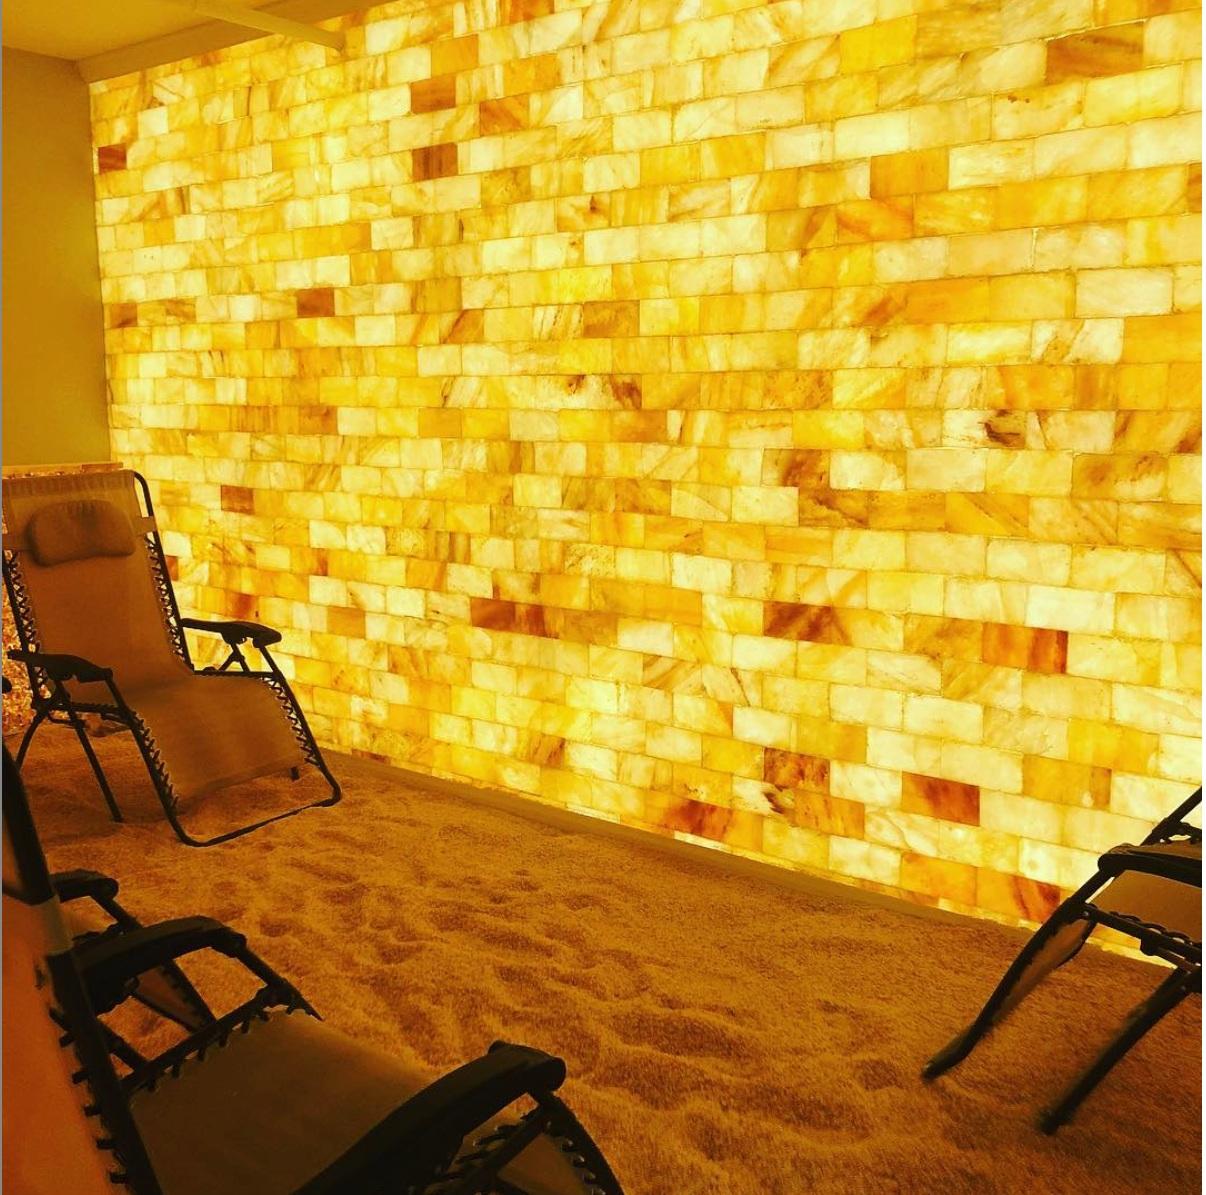 salt+room+in+salt+cave+-+halotherapy